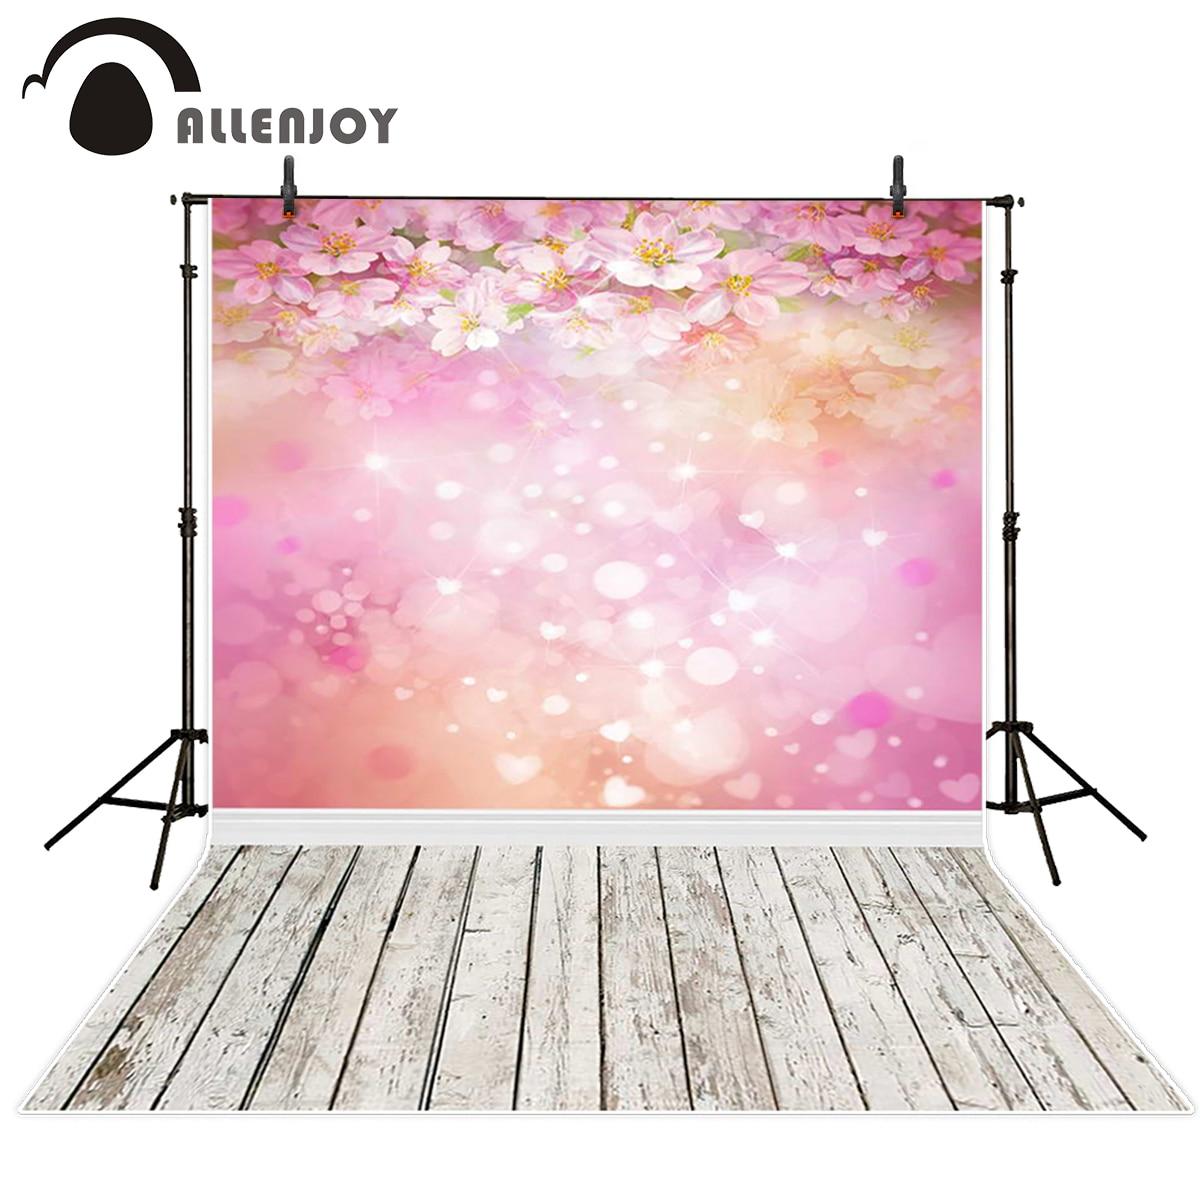 Allenjoy photography backdrops pink flower wood bokeh background photography backdrop for photo studio 5x7ft pink bokeh tulip landscape background photography floral artfabric backdrop d 8894